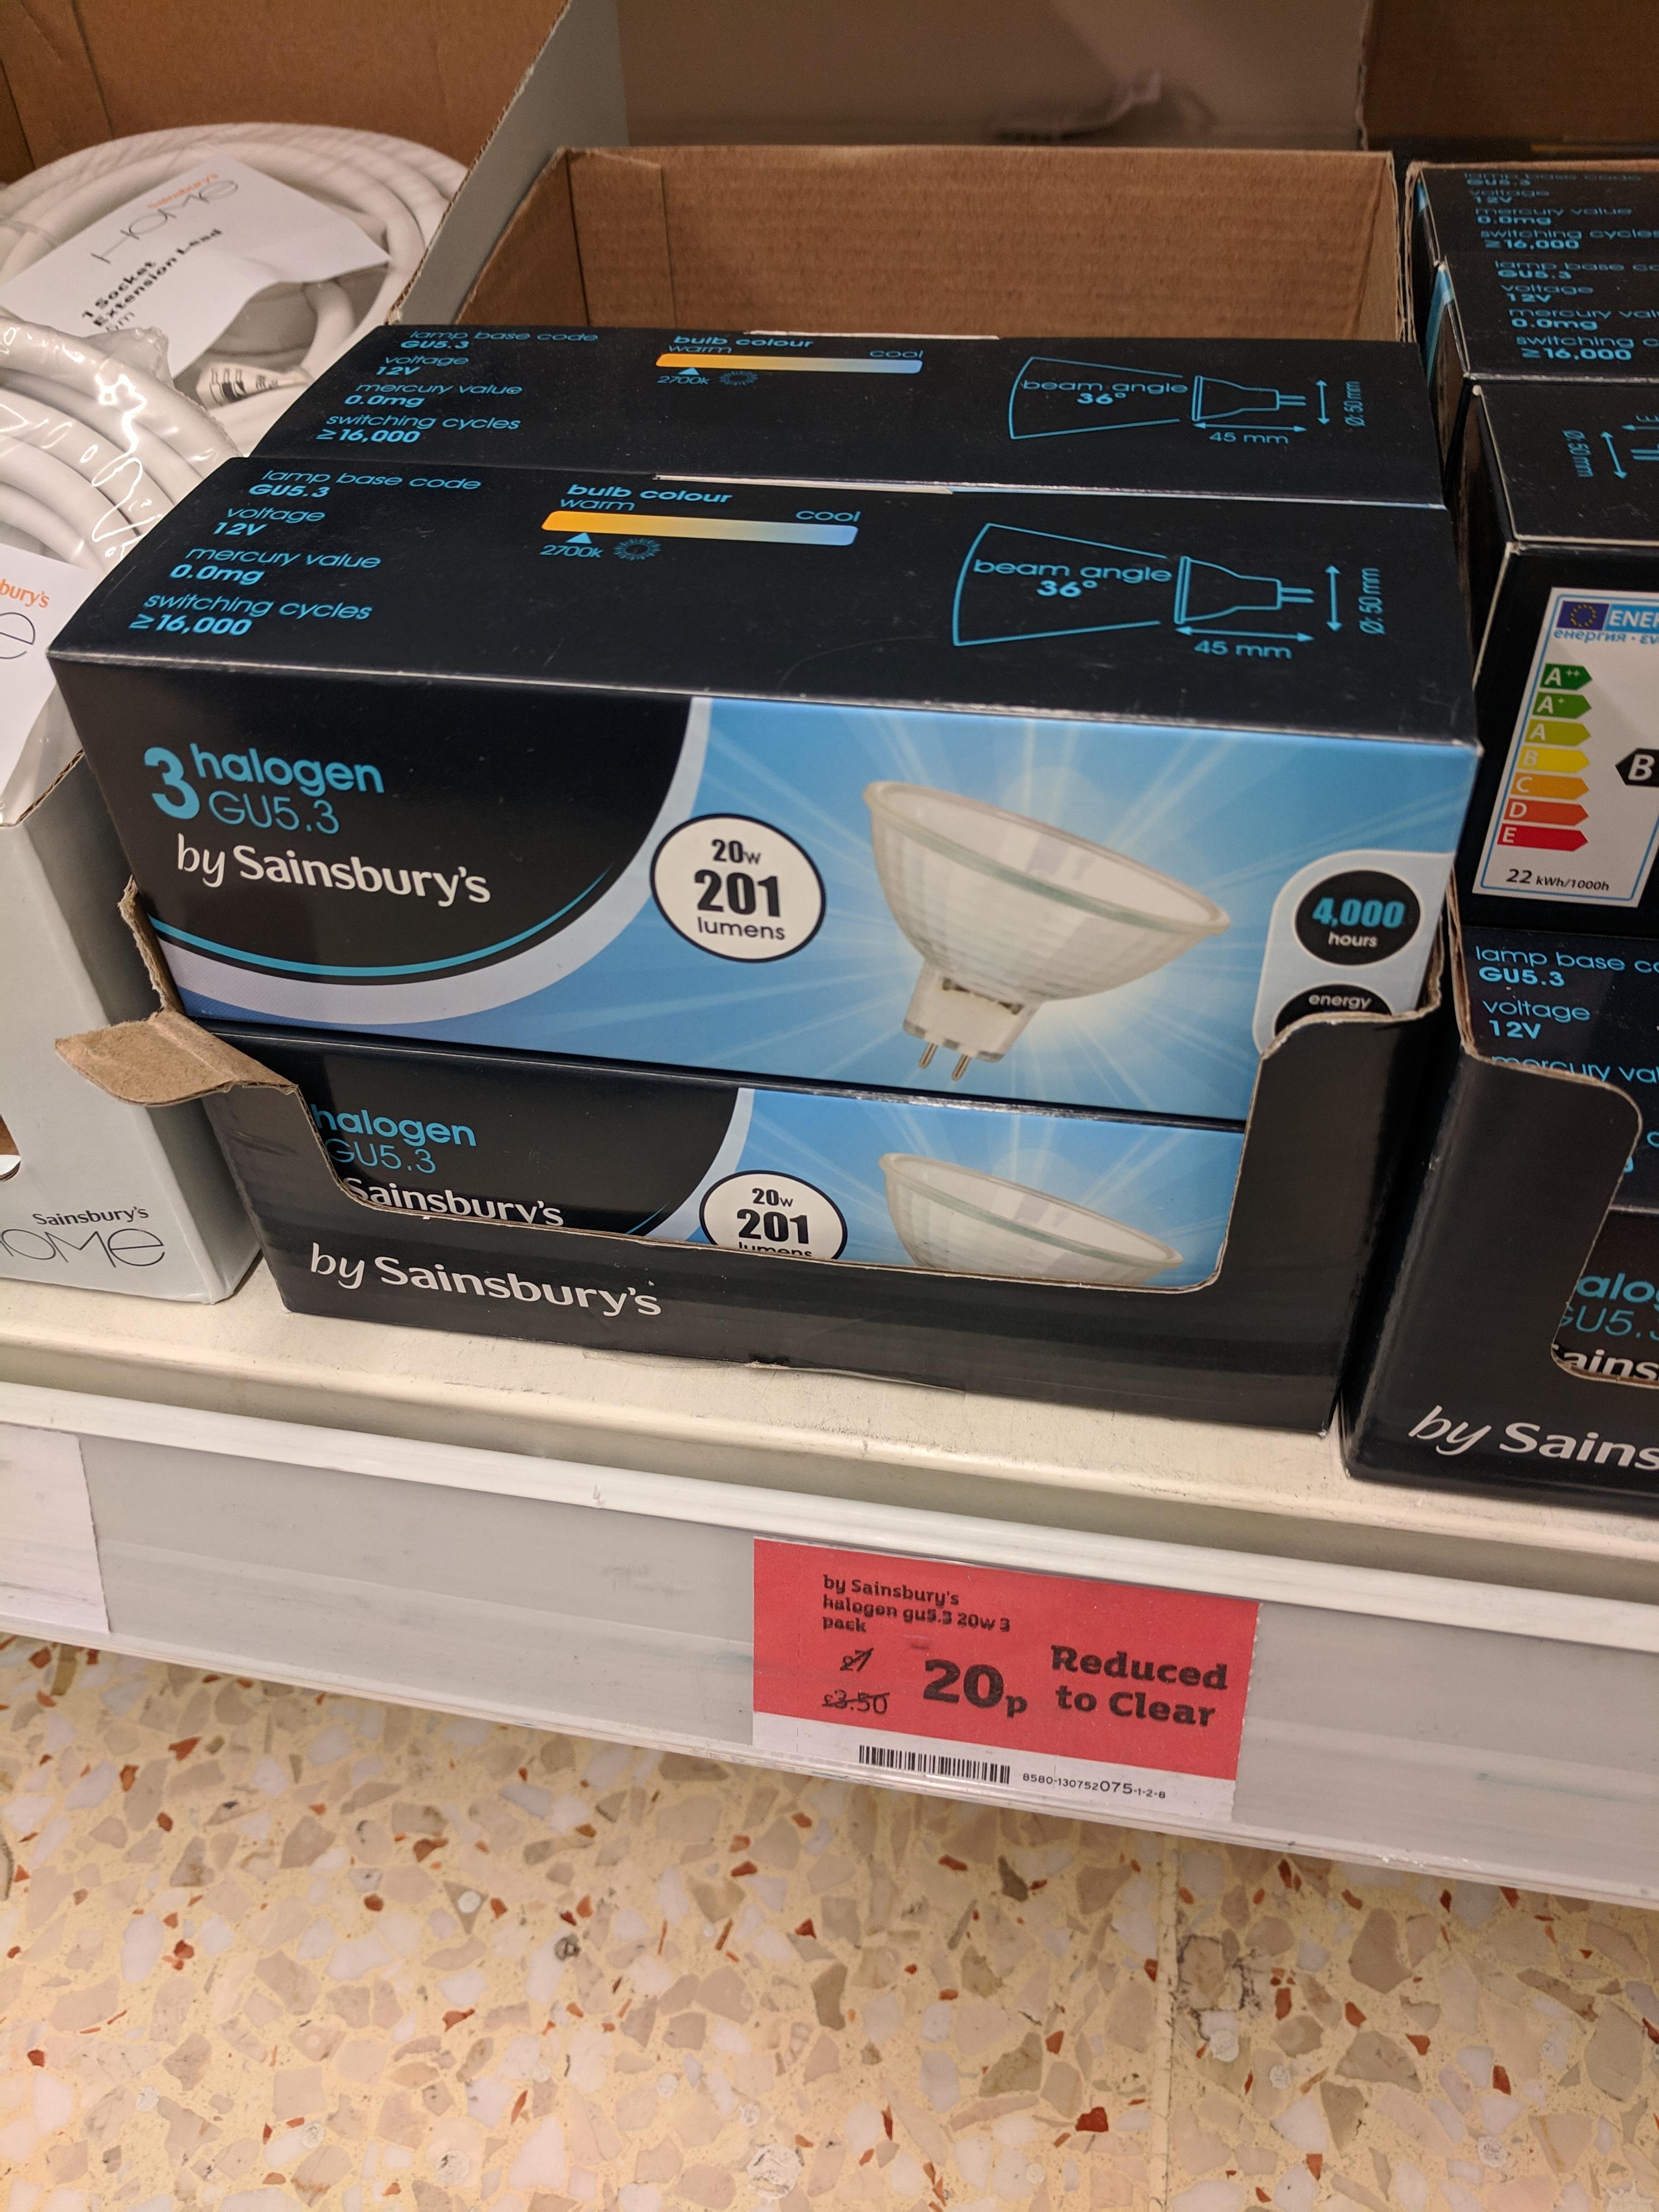 Halogen GU5.3 X 3  Sainsbury's - Whitechapel, London - 20p each